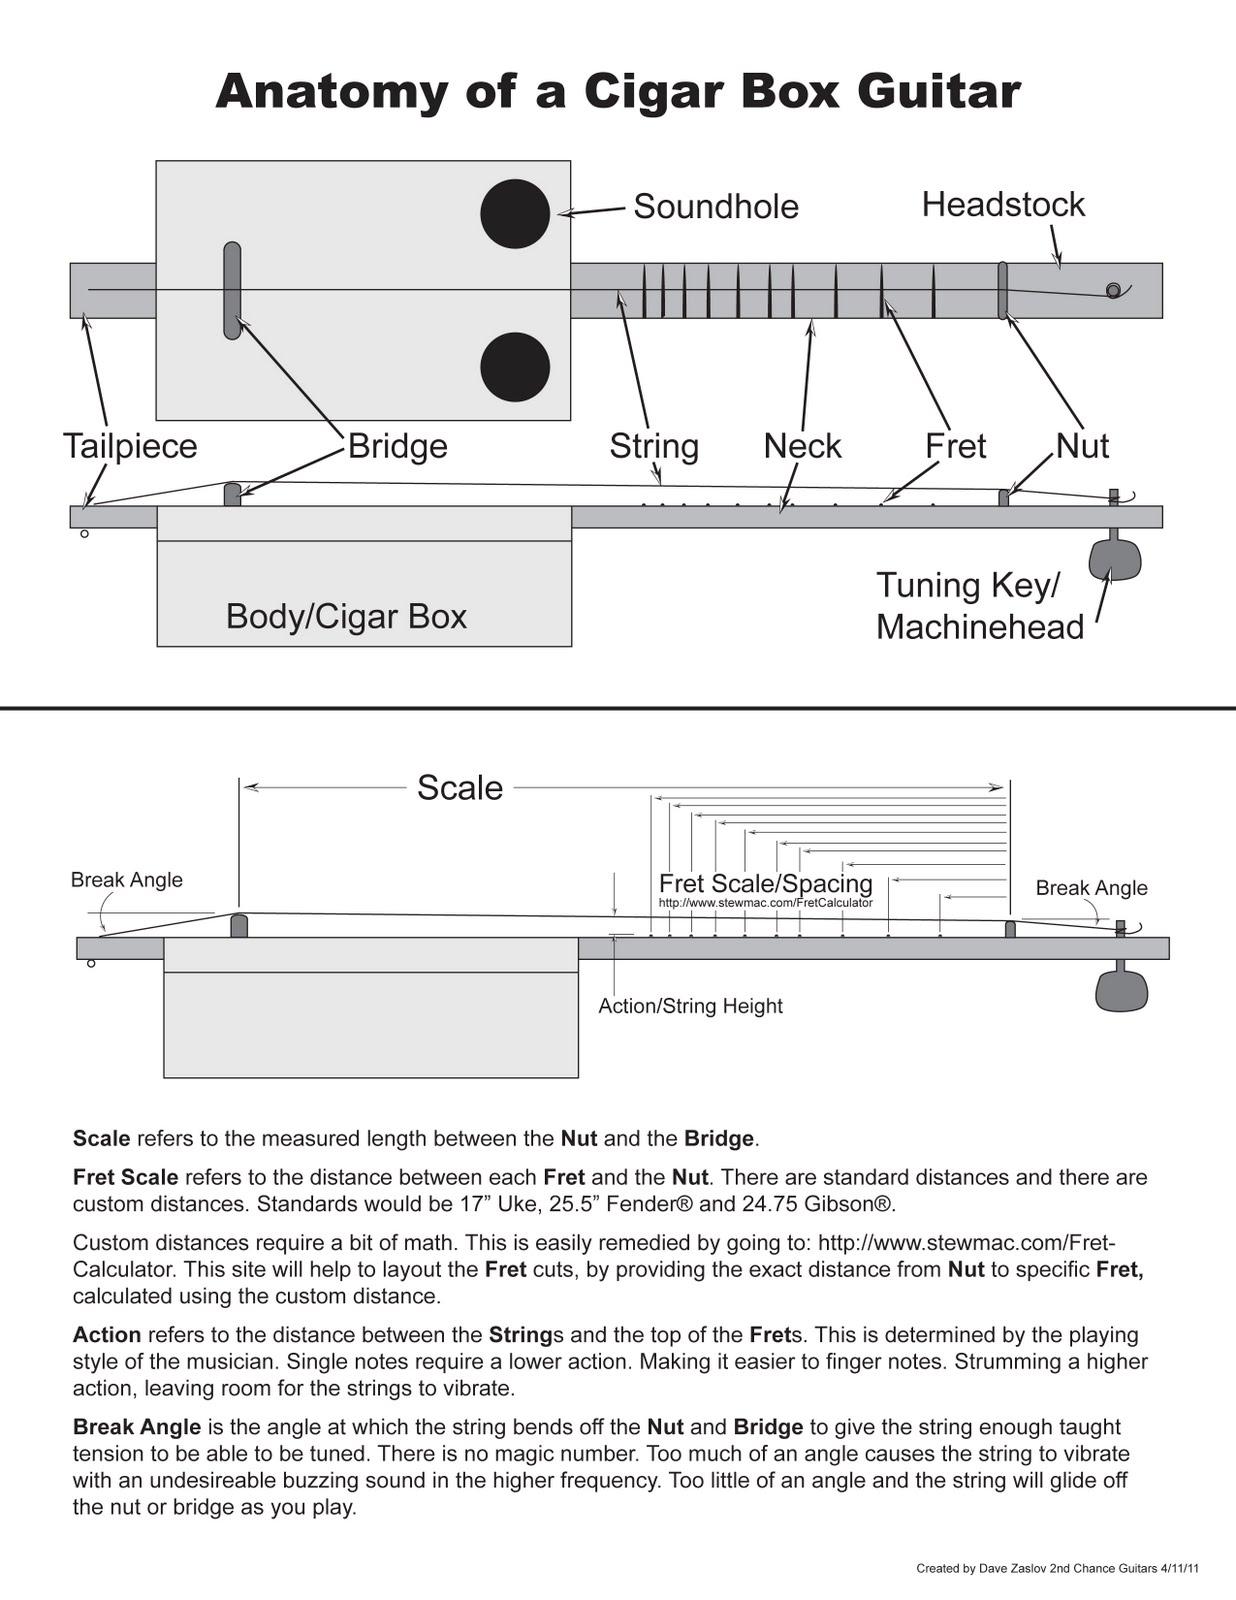 Cigar Box Guitar Diagram Electrical Drawing Wiring 2nd Chance Guitars Class 2 Rh 2ndchanceguitars Blogspot Com 3 String